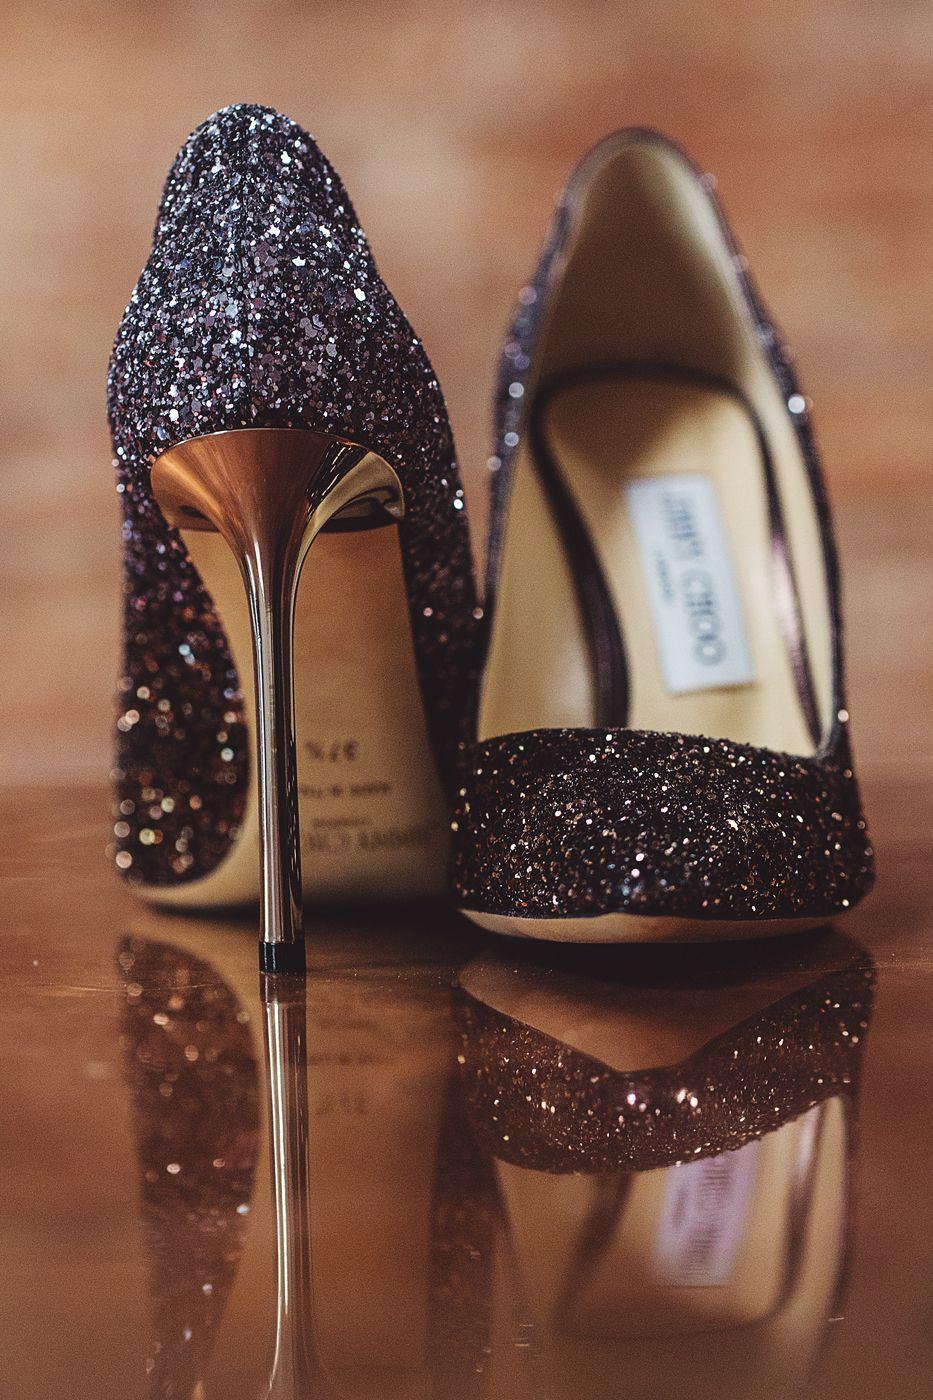 e0ec76d031cdf6 glam glitter wedding shoes. glam glitter wedding shoes Shoes Heels ...